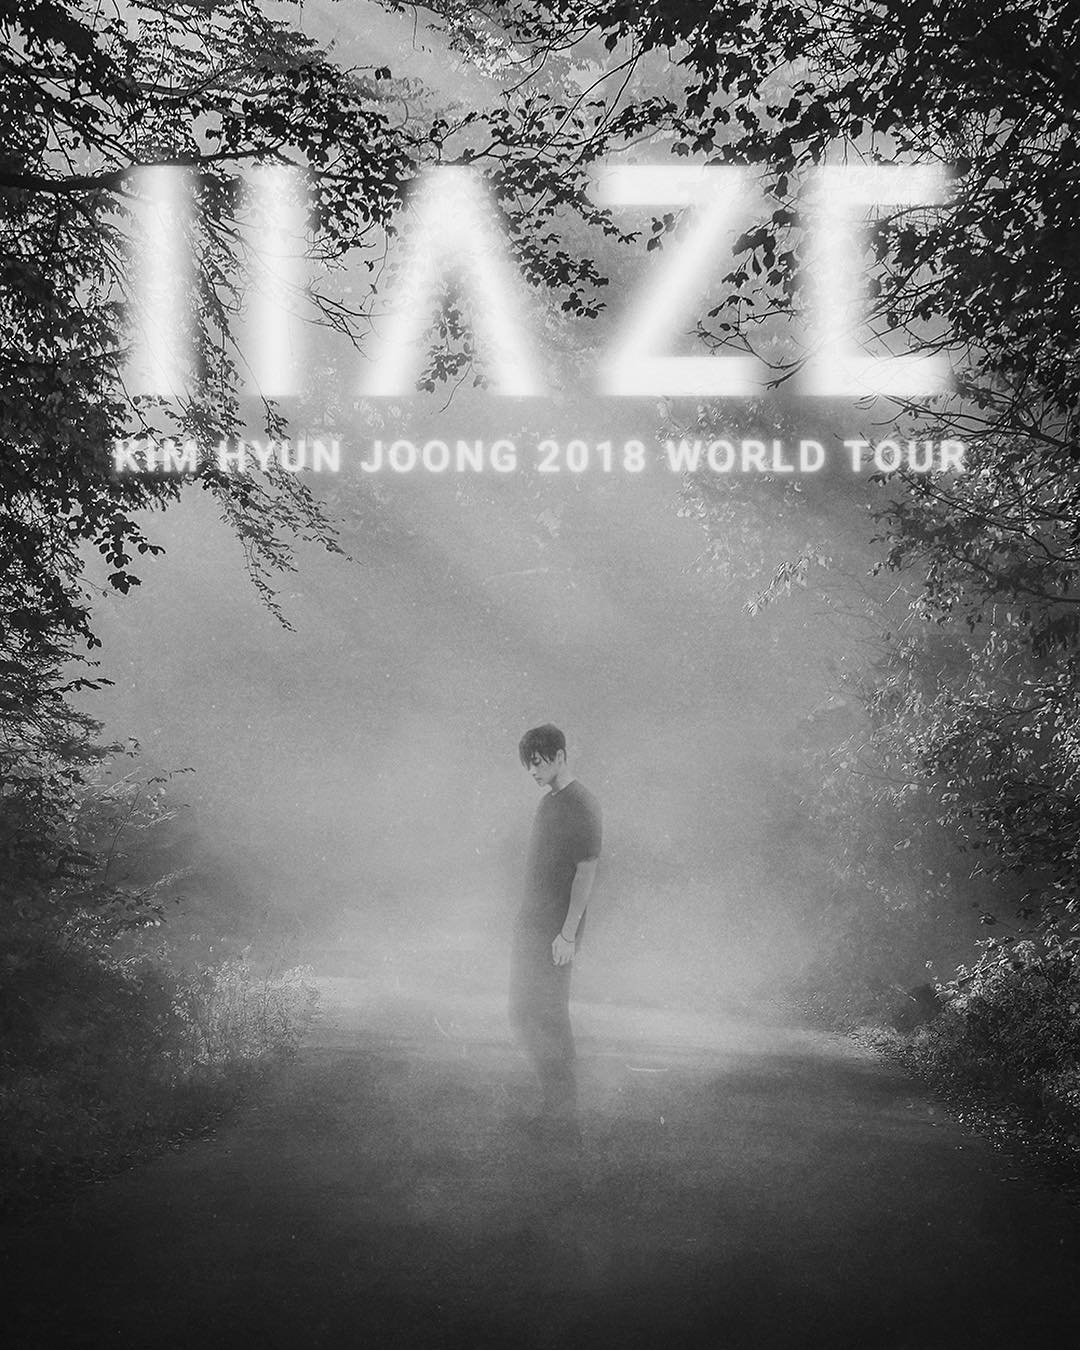 [Instagram] seung_kyoya Instagram Update [2017.10.22]